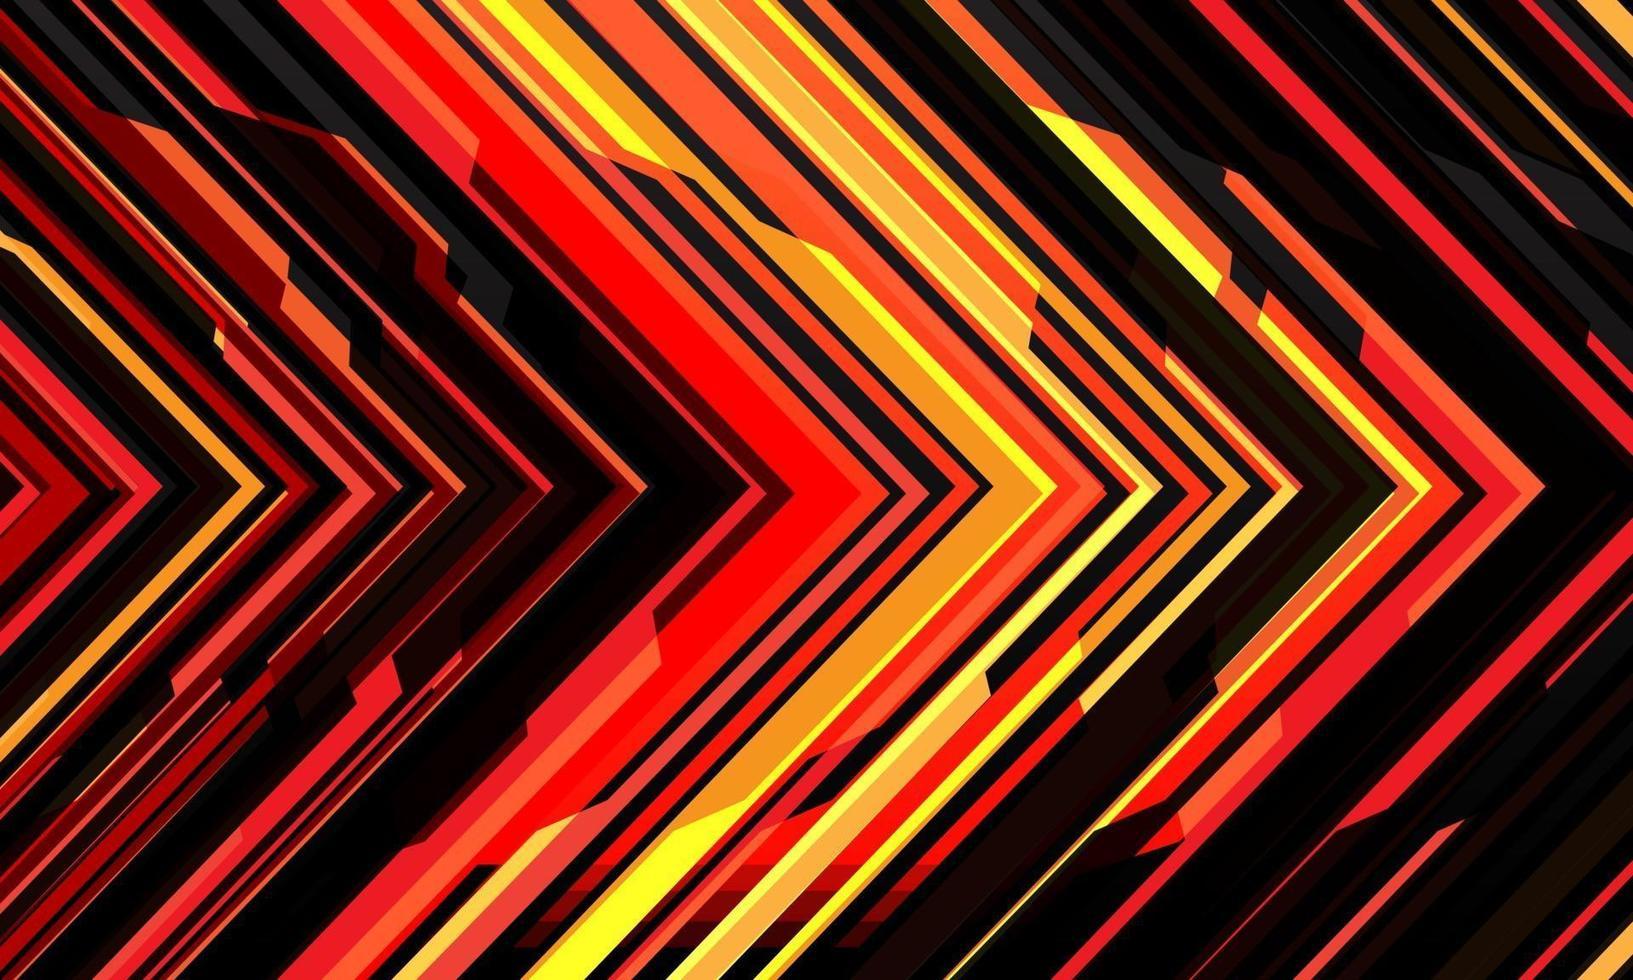 abstrakt röd gul svart pil ljus cyber geometrisk teknik futuristisk riktning design modern bakgrund vektorillustration. vektor